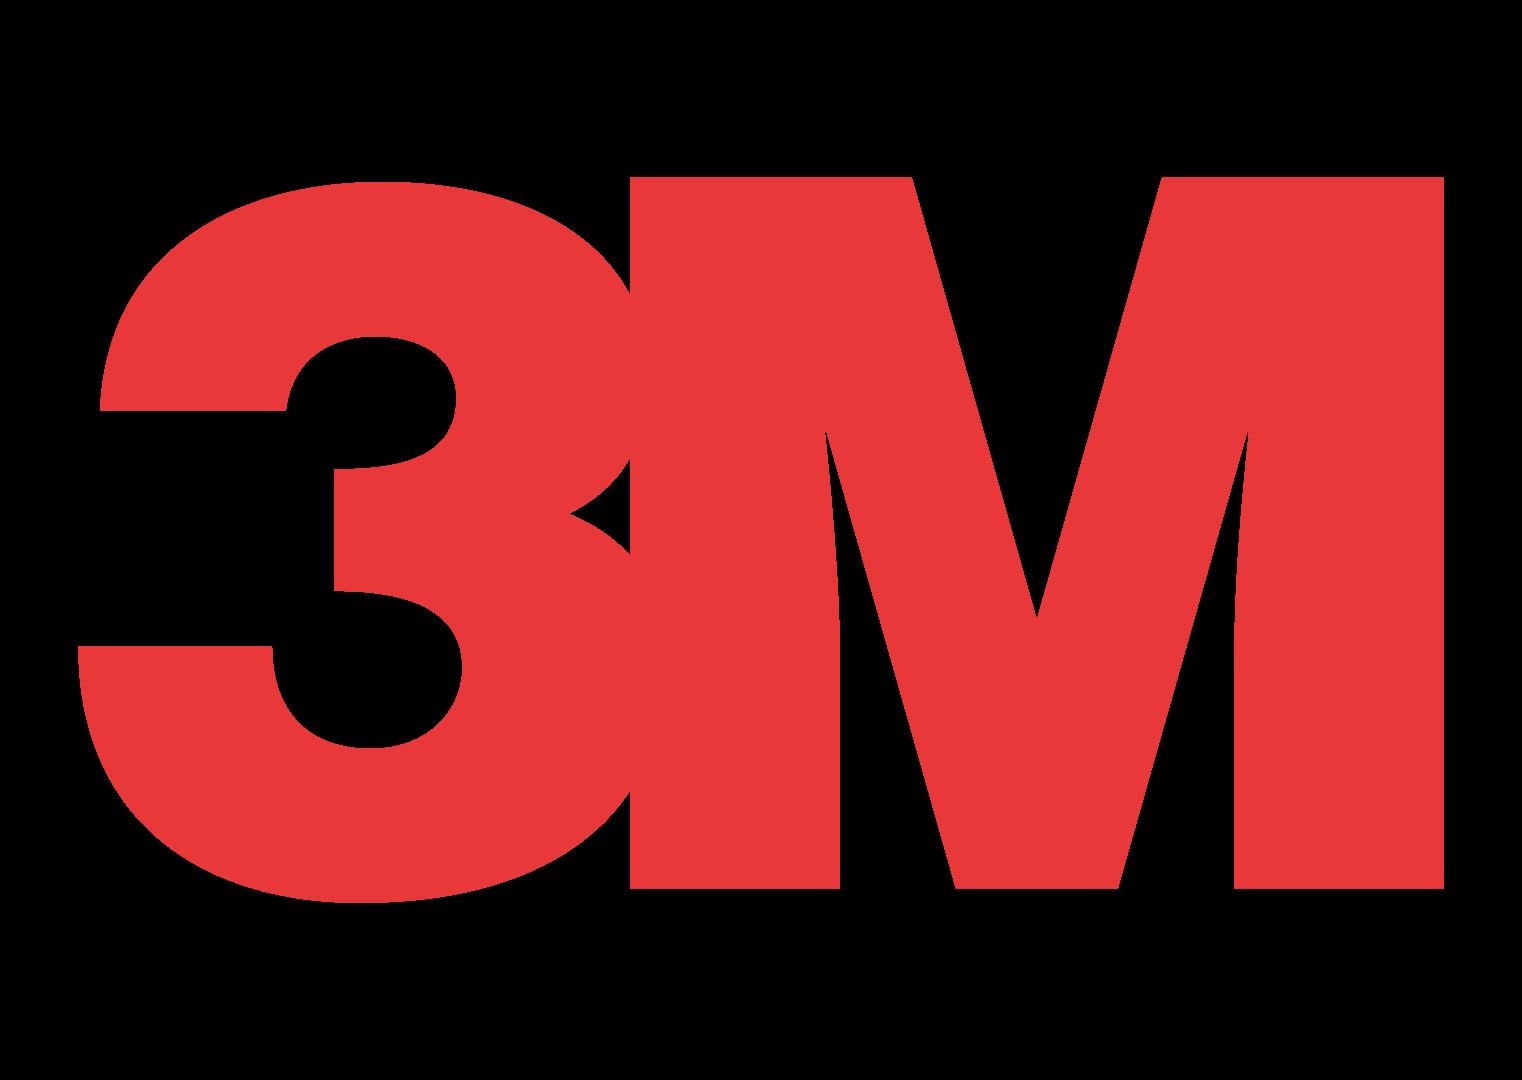 3m-logo-vector.png